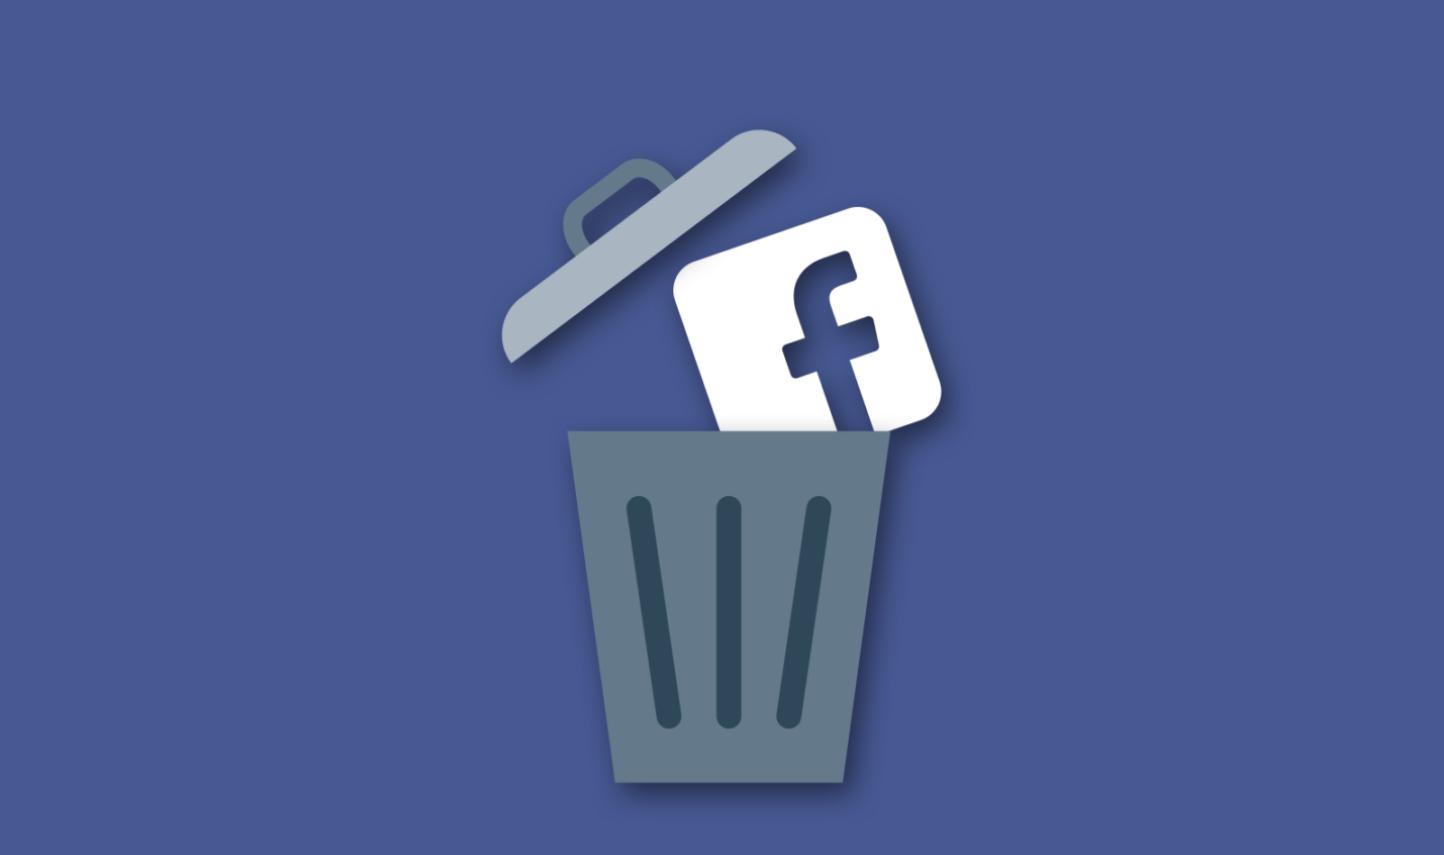 izdzēst facebook